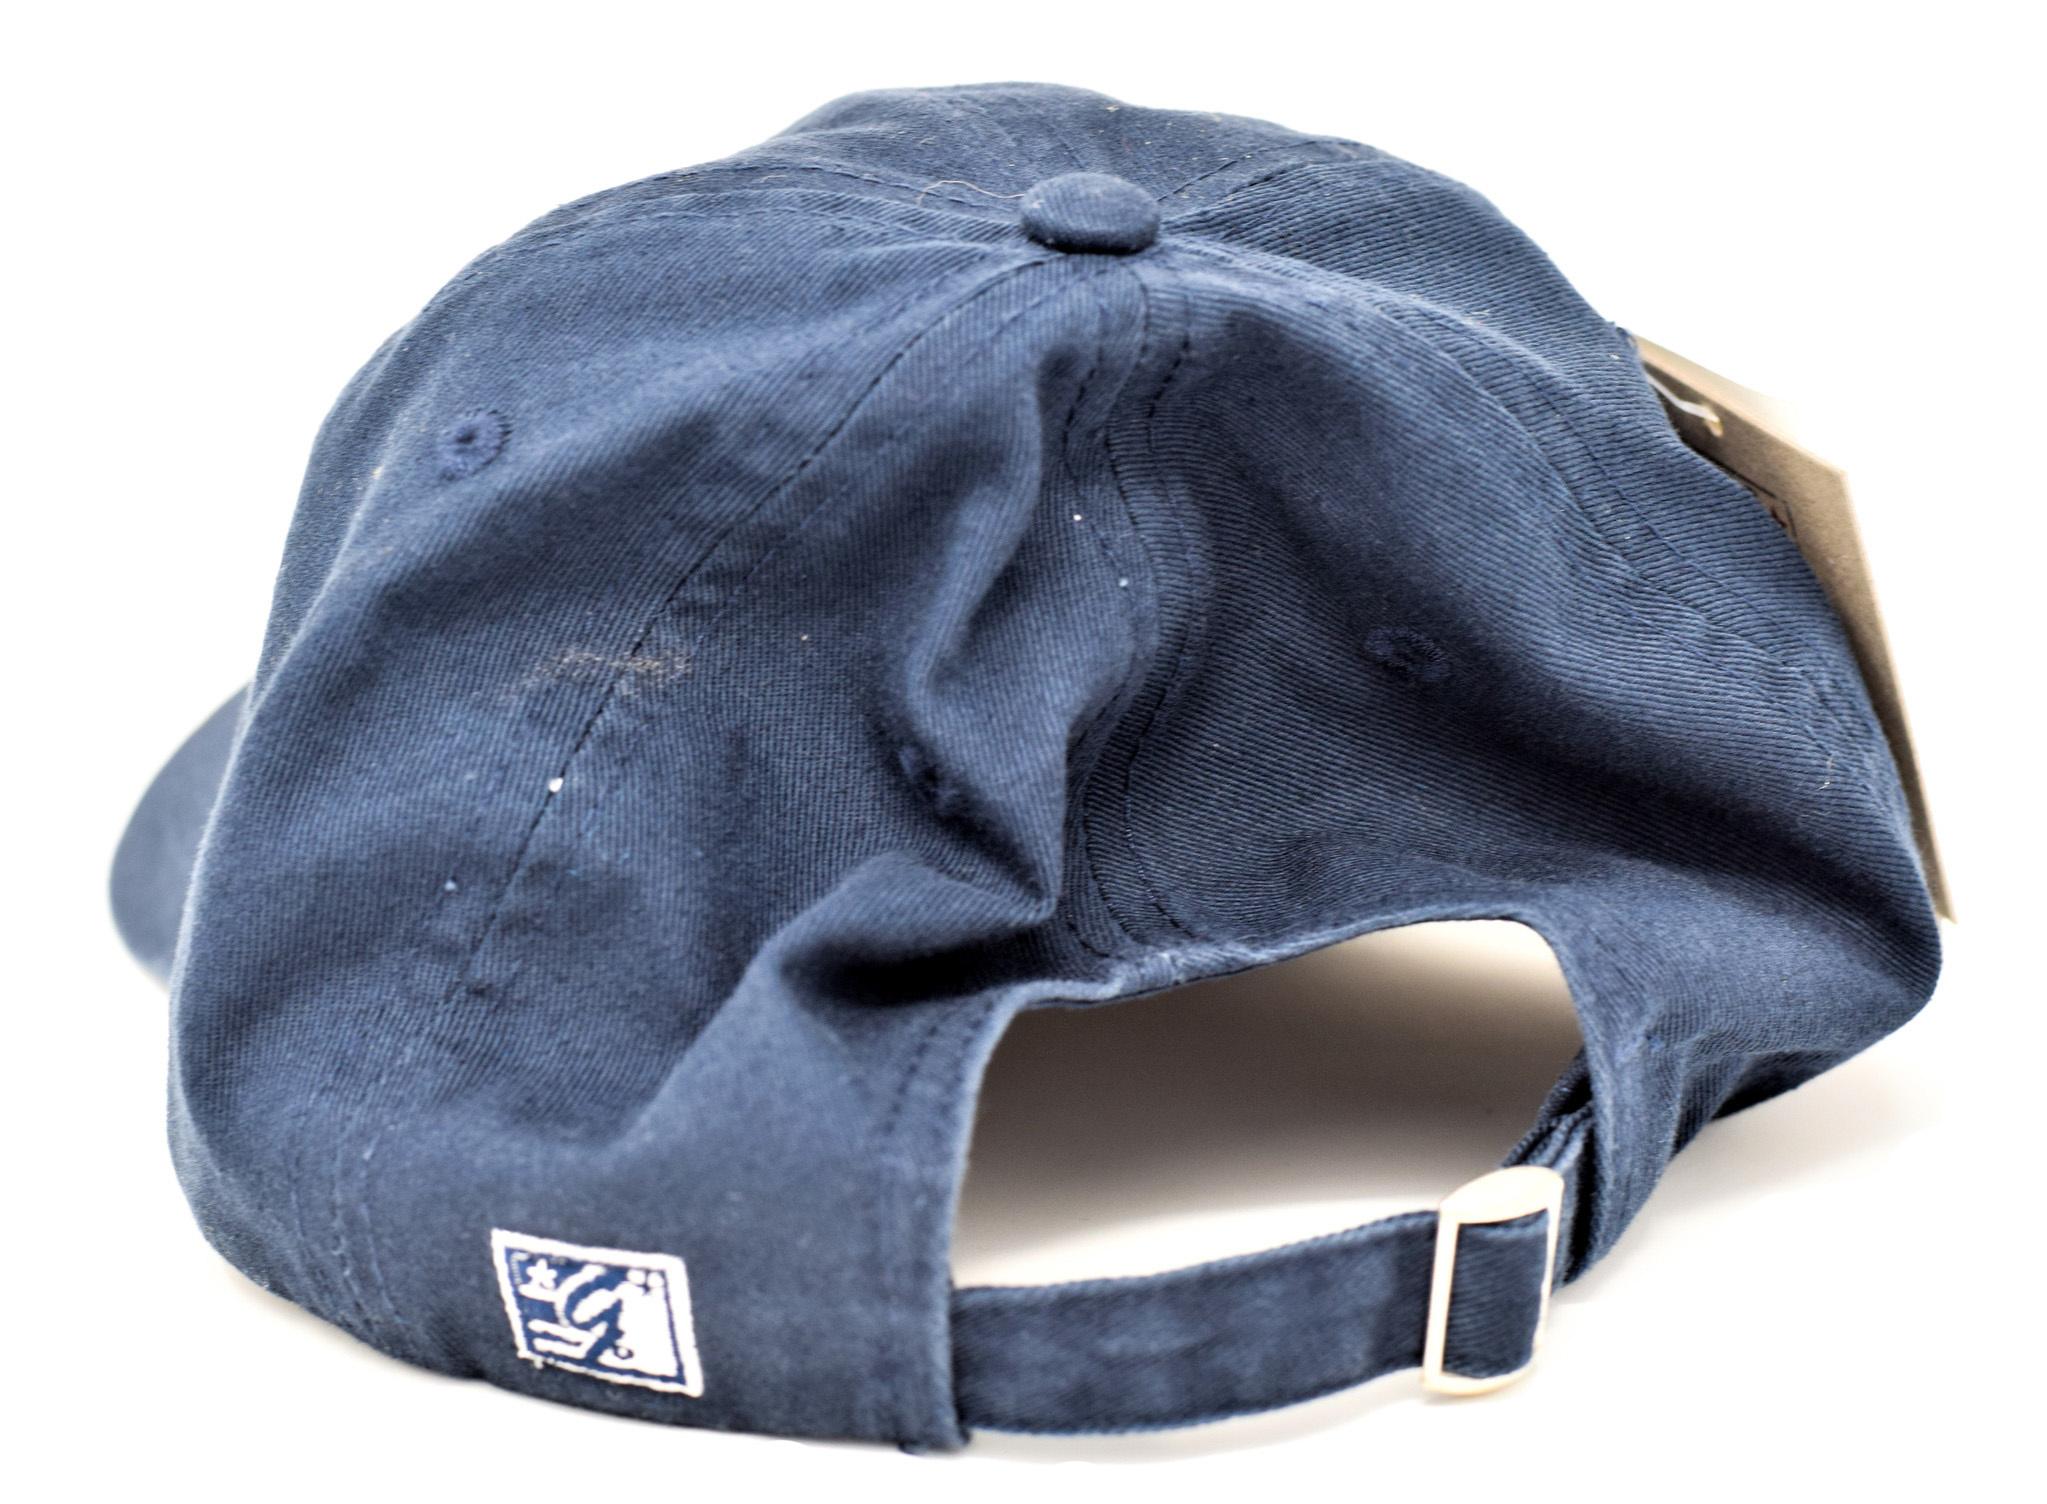 Navy Berea College Grandparent Ball Cap Strap-3